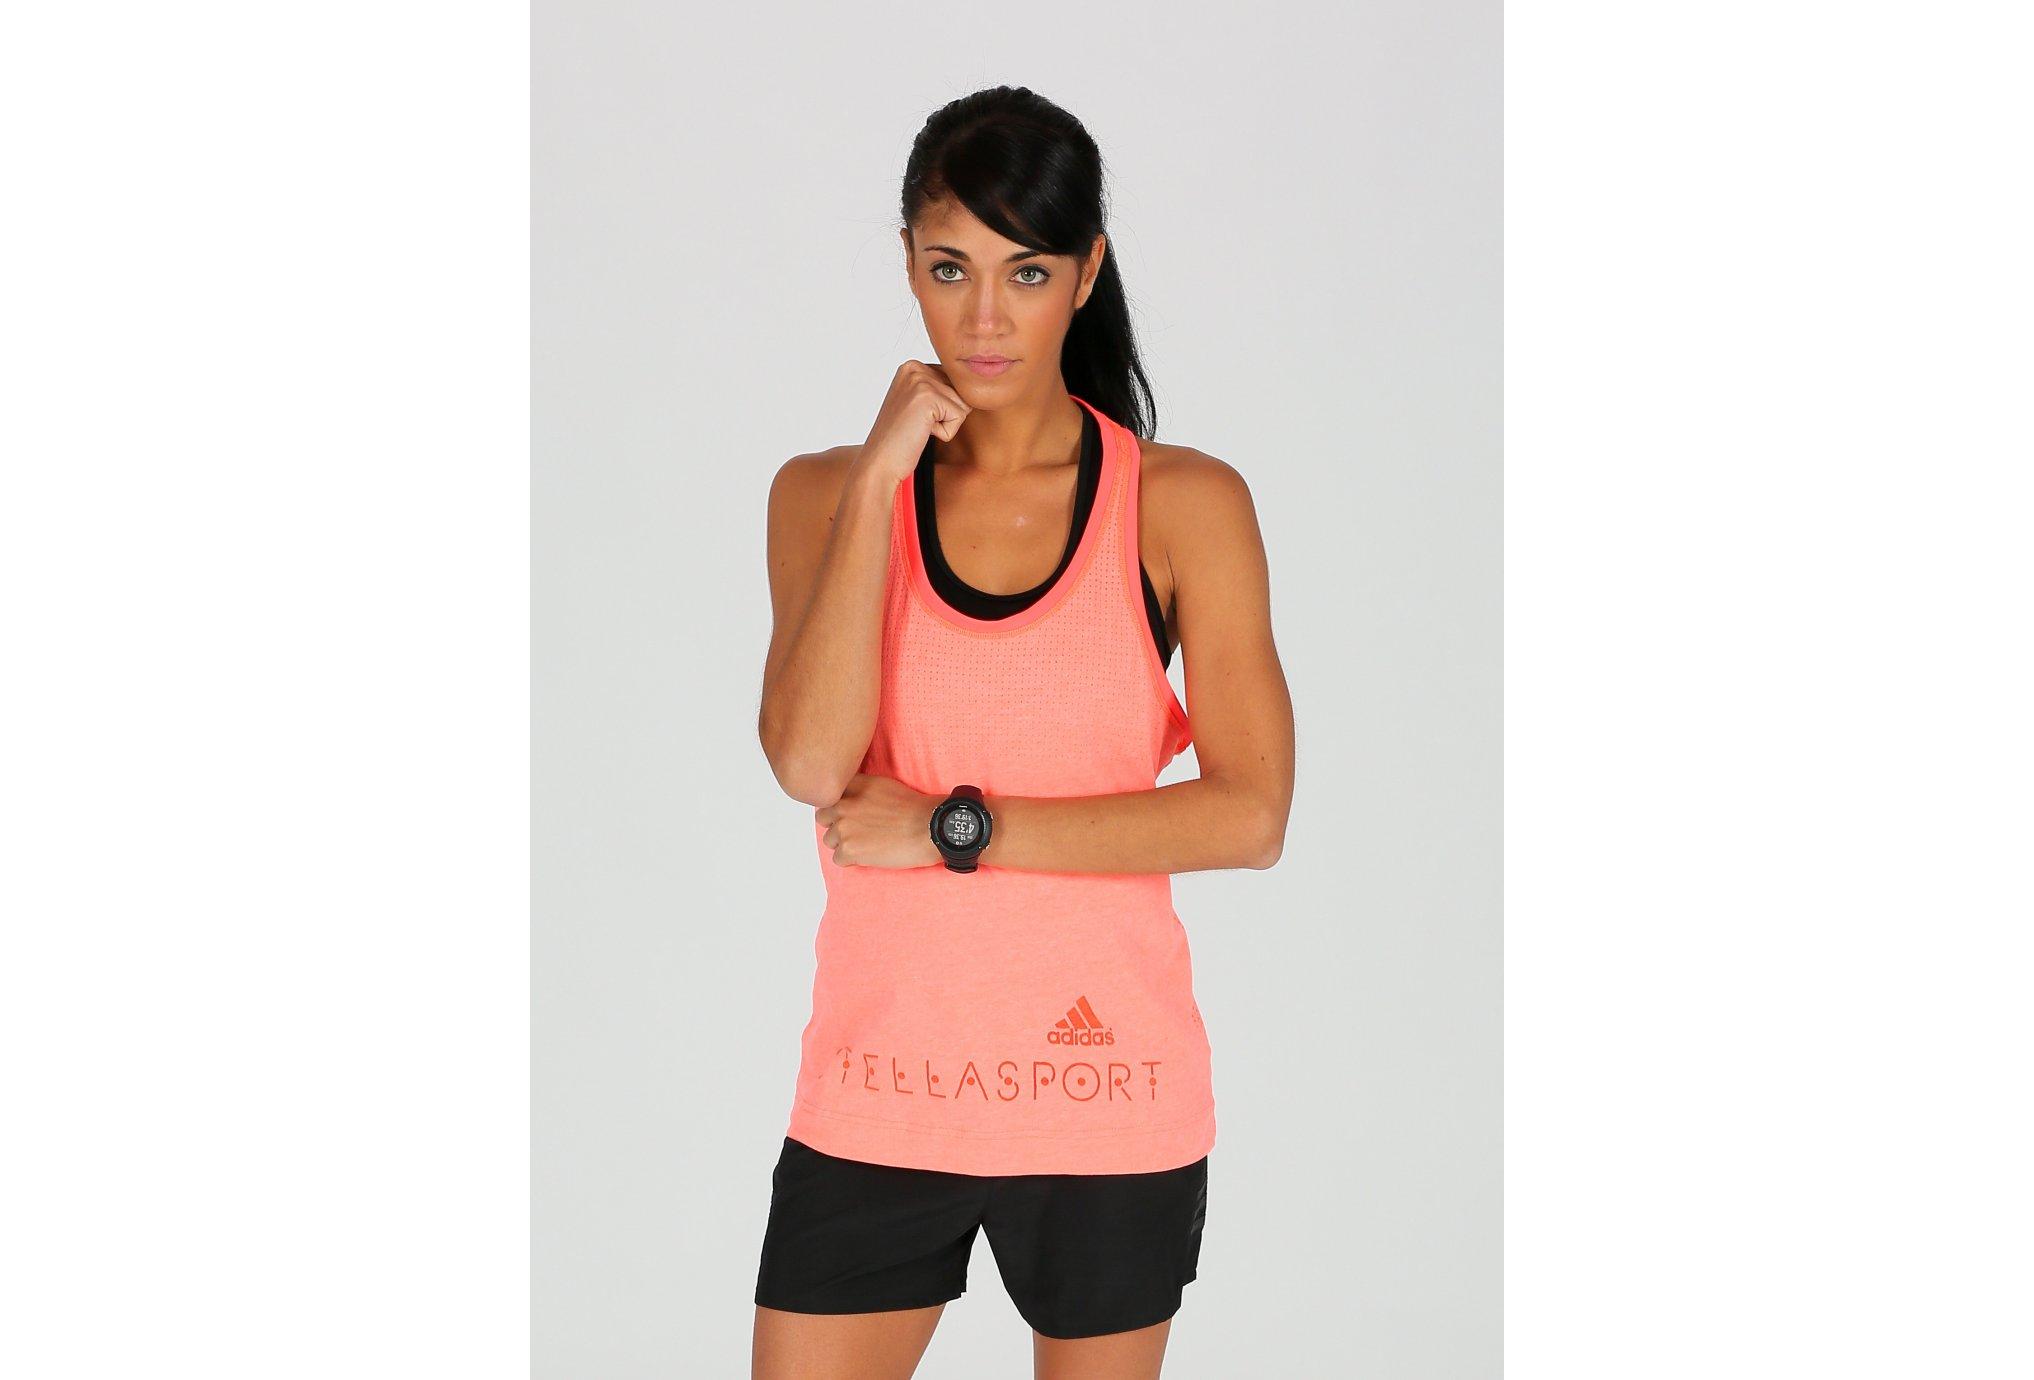 Adidas Stellasport aeroknit w vêtement running femme